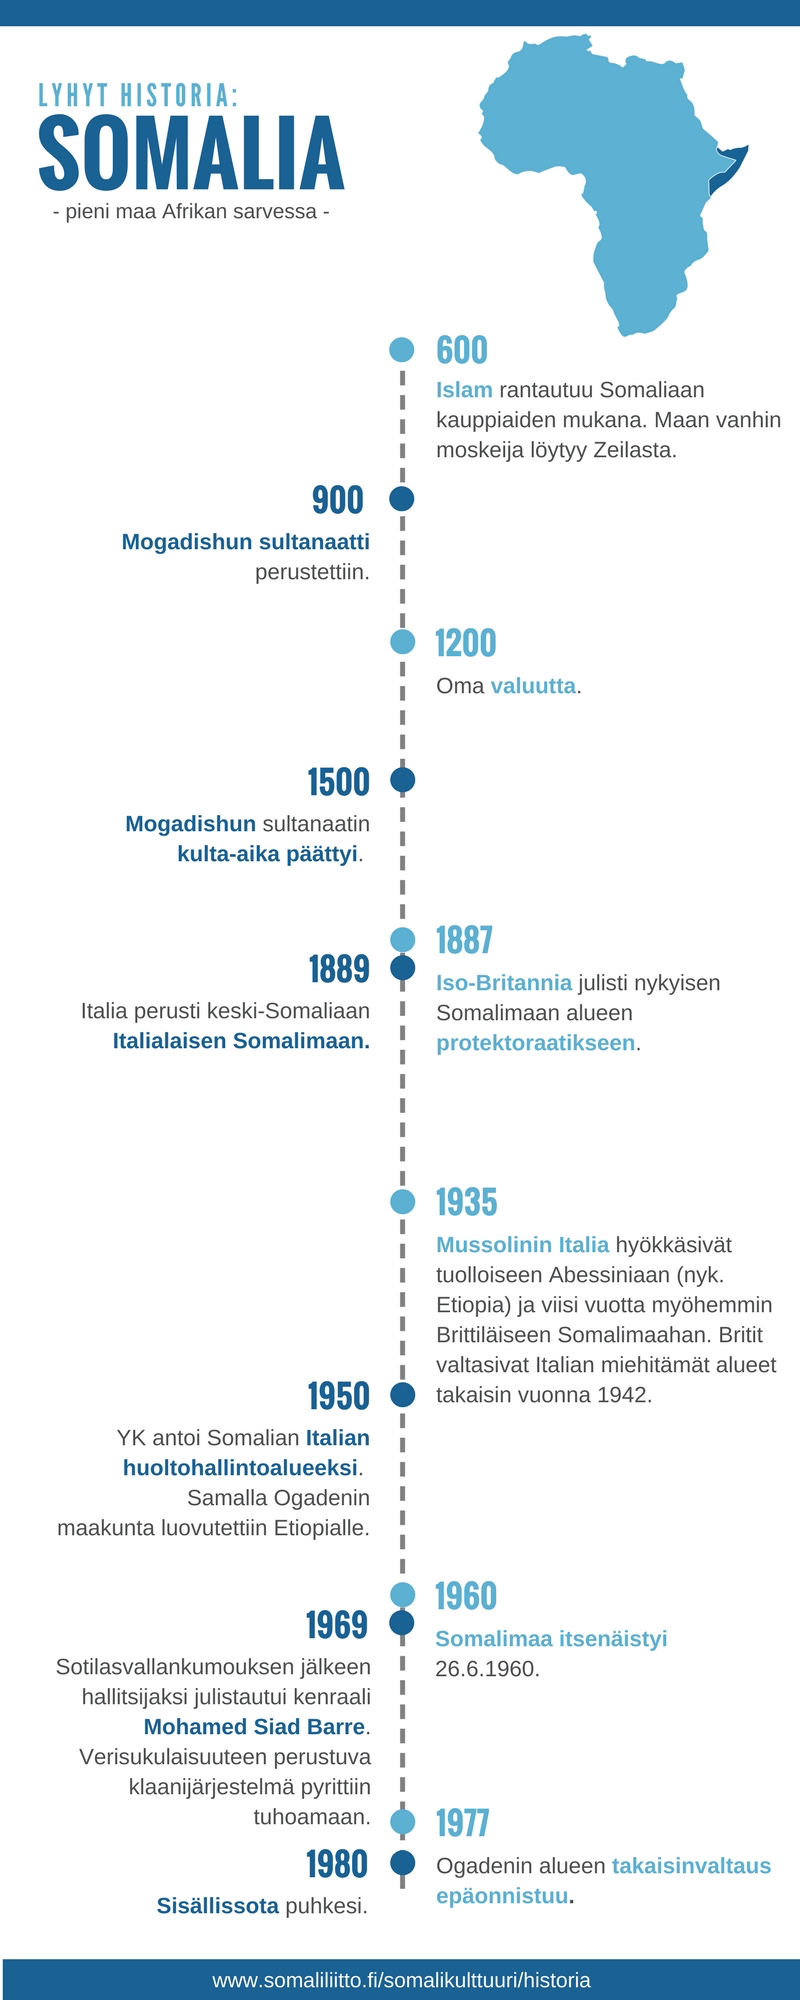 Somalian lyhyt historia.